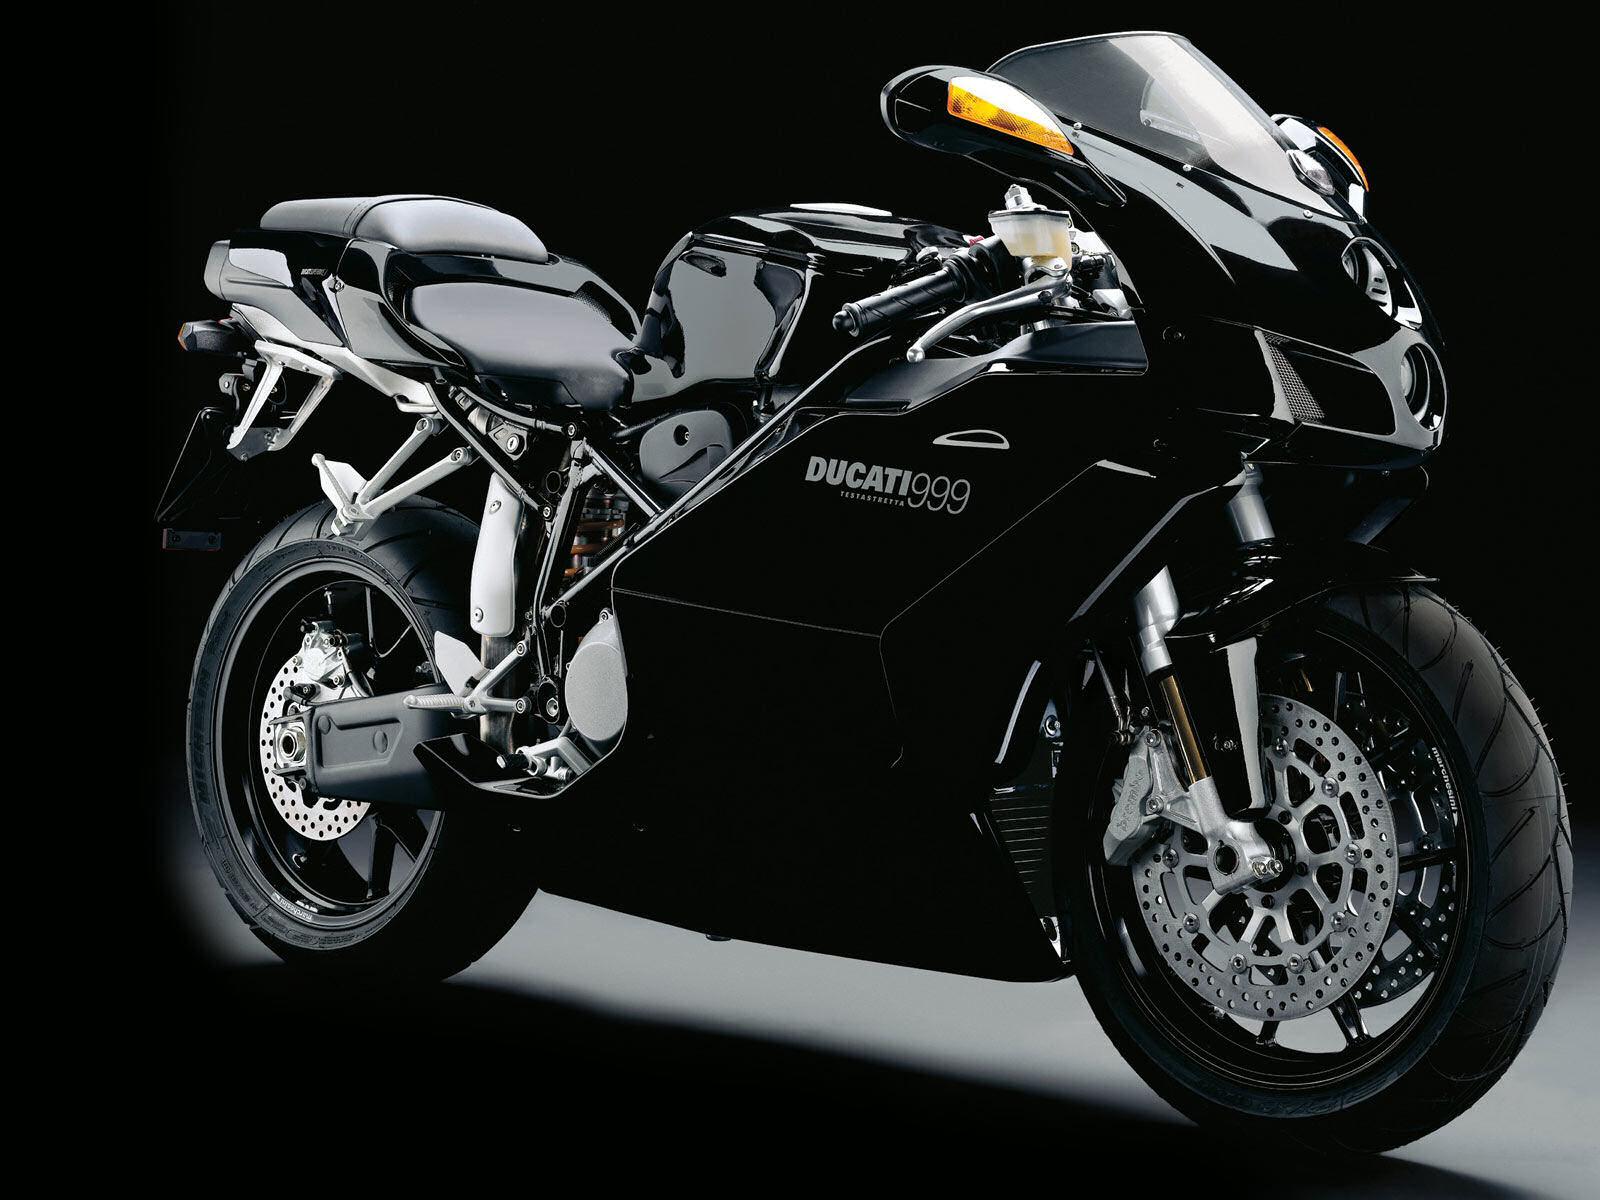 http://3.bp.blogspot.com/-uOuZ4pygh0E/UBKwHYVJqiI/AAAAAAAAAEM/YrAztFNmFr4/s1600/sports+bike+wallpaper-1.jpeg